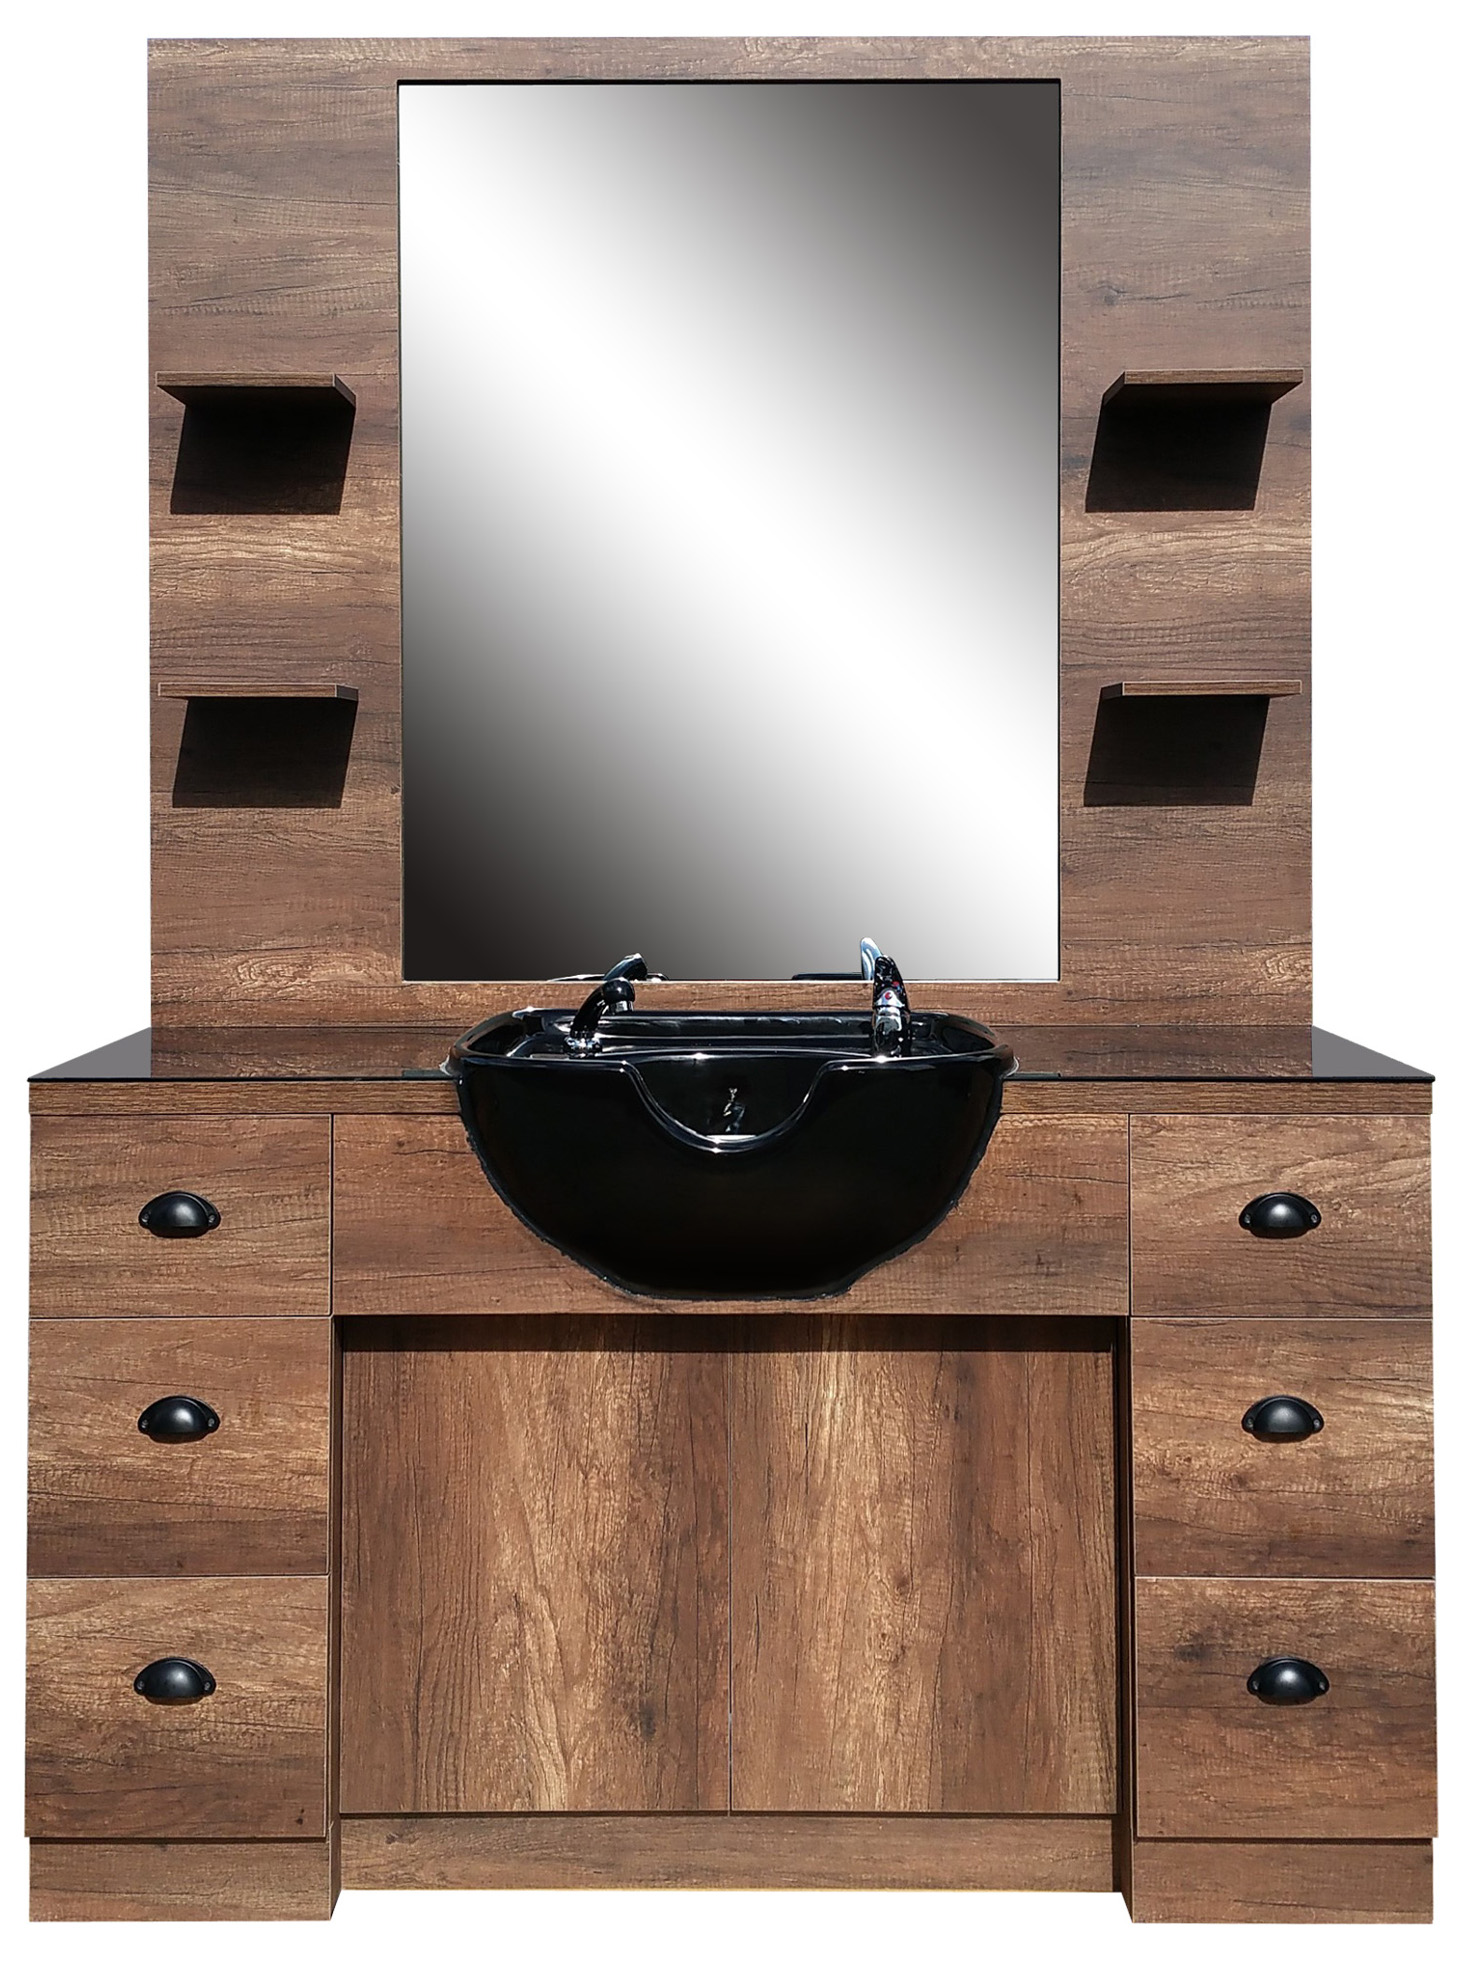 Barber obsluha se zrcadlem a umyvadlem Hairway Barry - hnědá/černá (59222-W50-B) + DÁREK ZDARMA